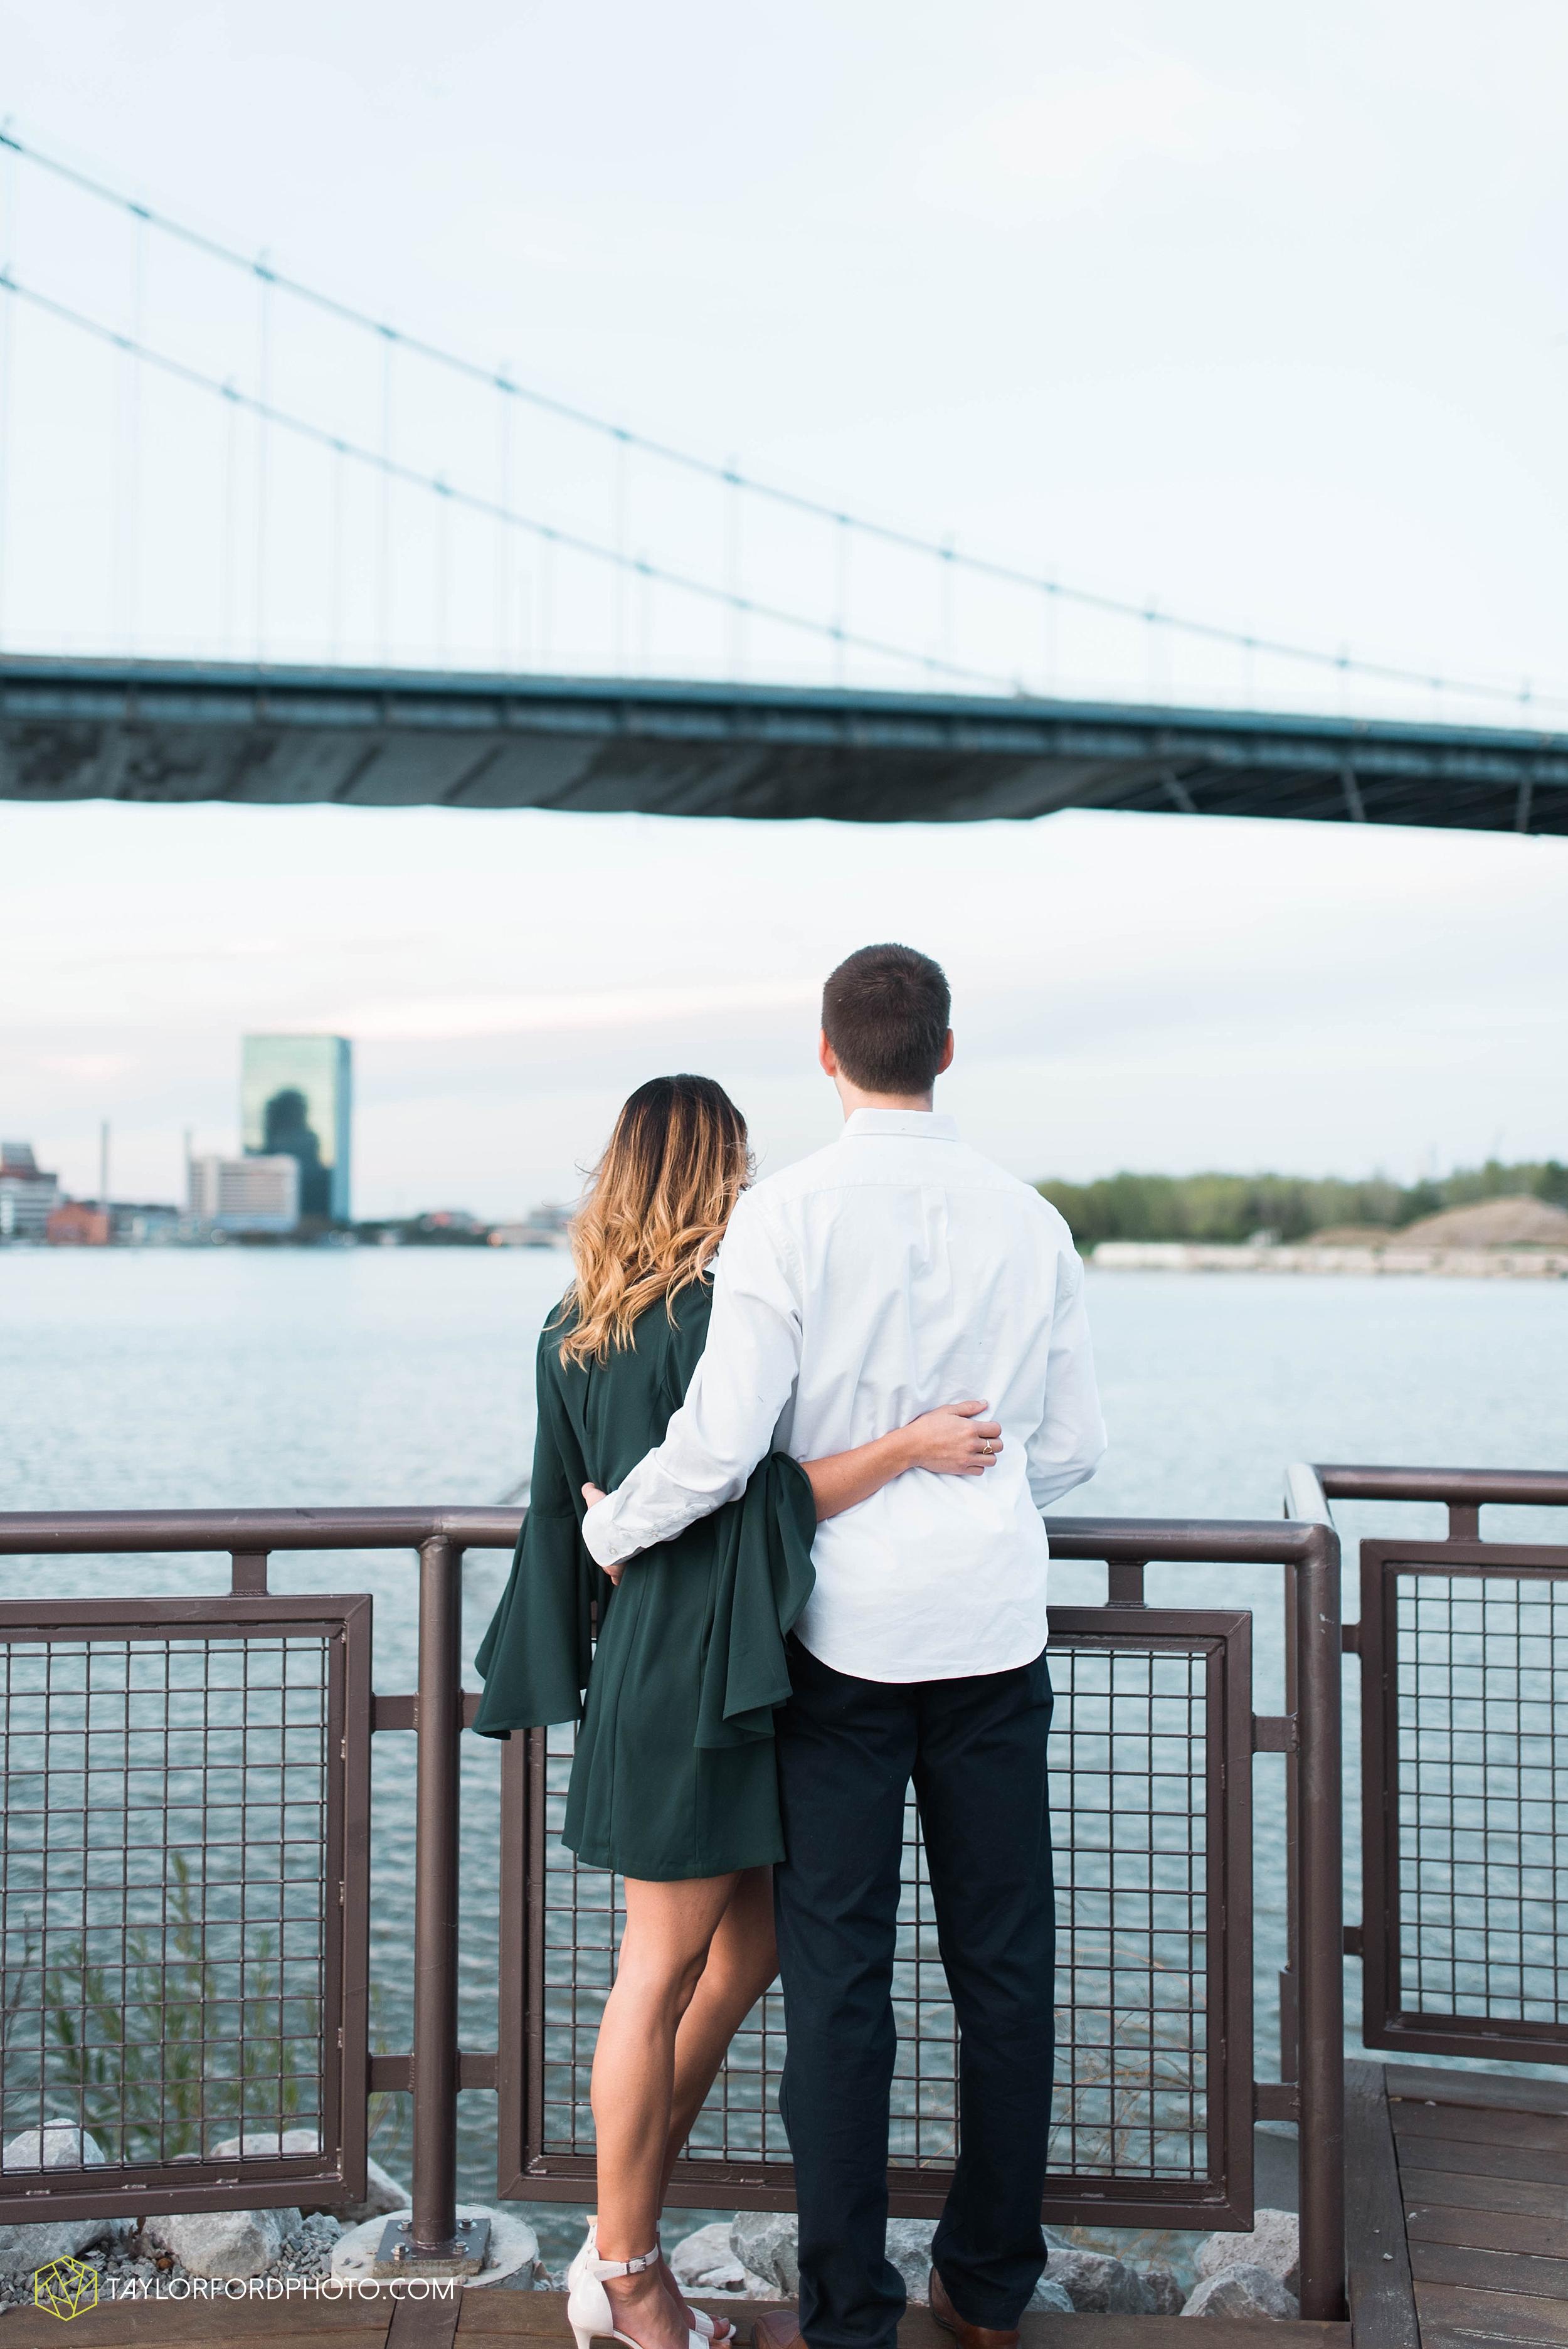 toledo-ohio-engagement-wedding-photographer-Taylor-Ford-Photography-oaks-openings-toledo-metro_3690.jpg